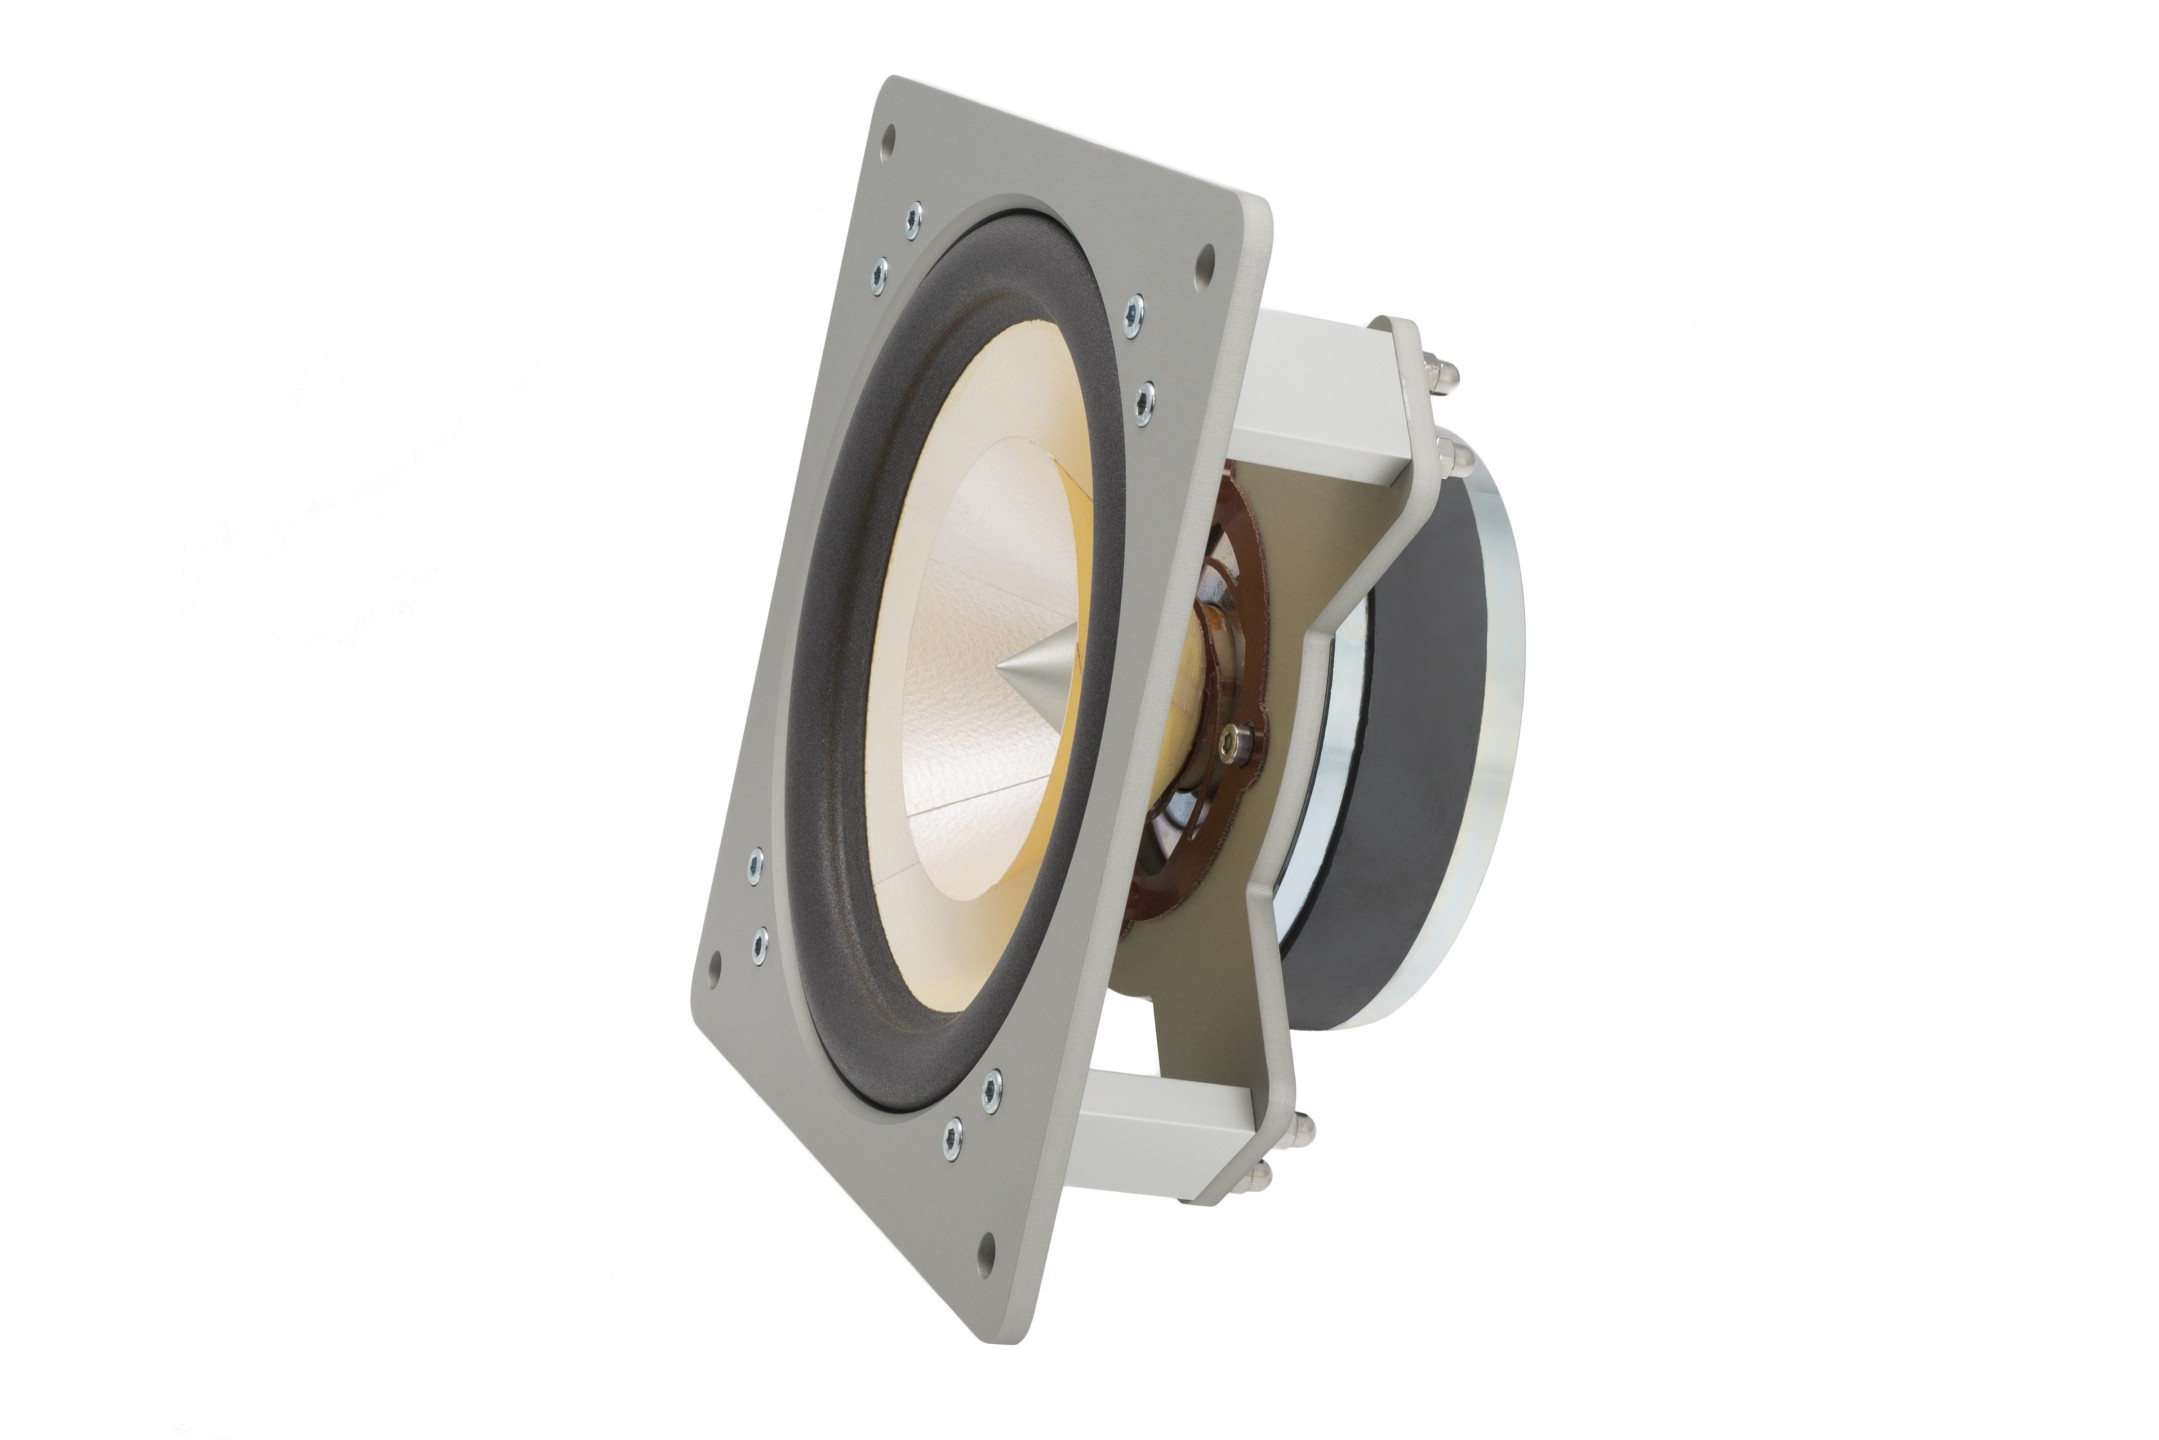 Cube Audio Horns & Fullrange Drivers-1t3a9688a-jpg